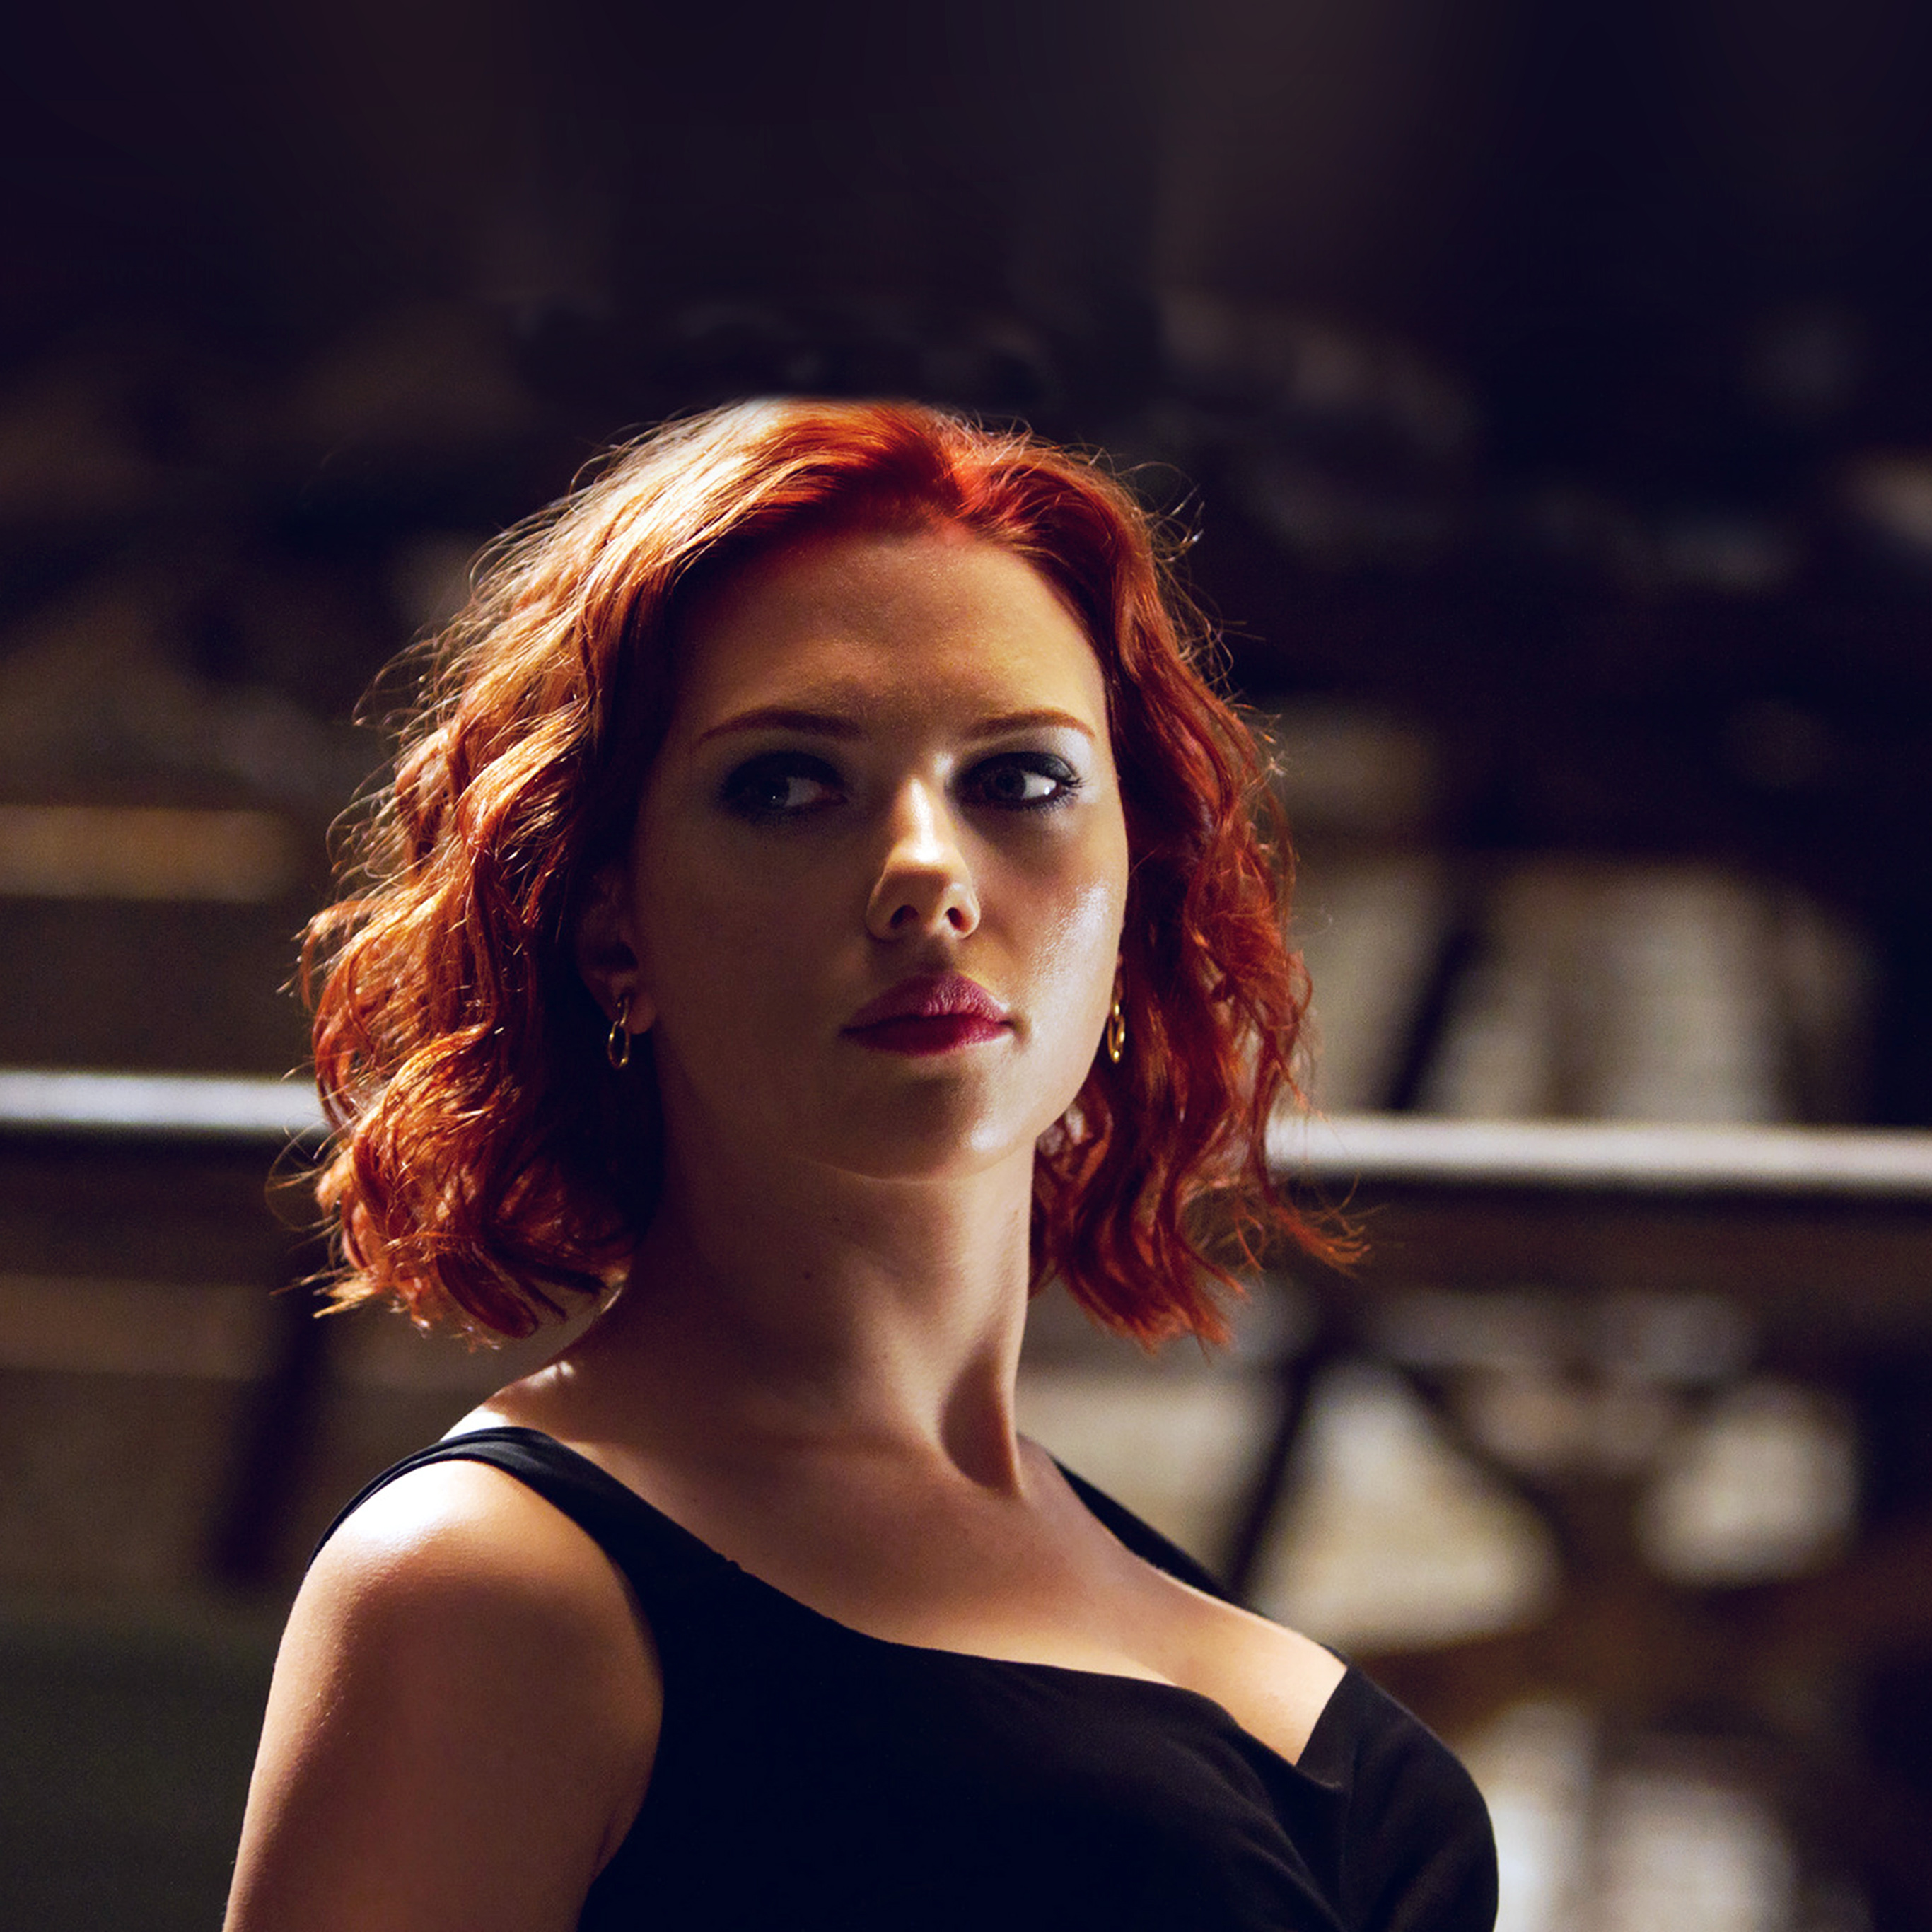 Hf29 Avengers Natasha Scarlett Johansson Sexy Hero Papers Co